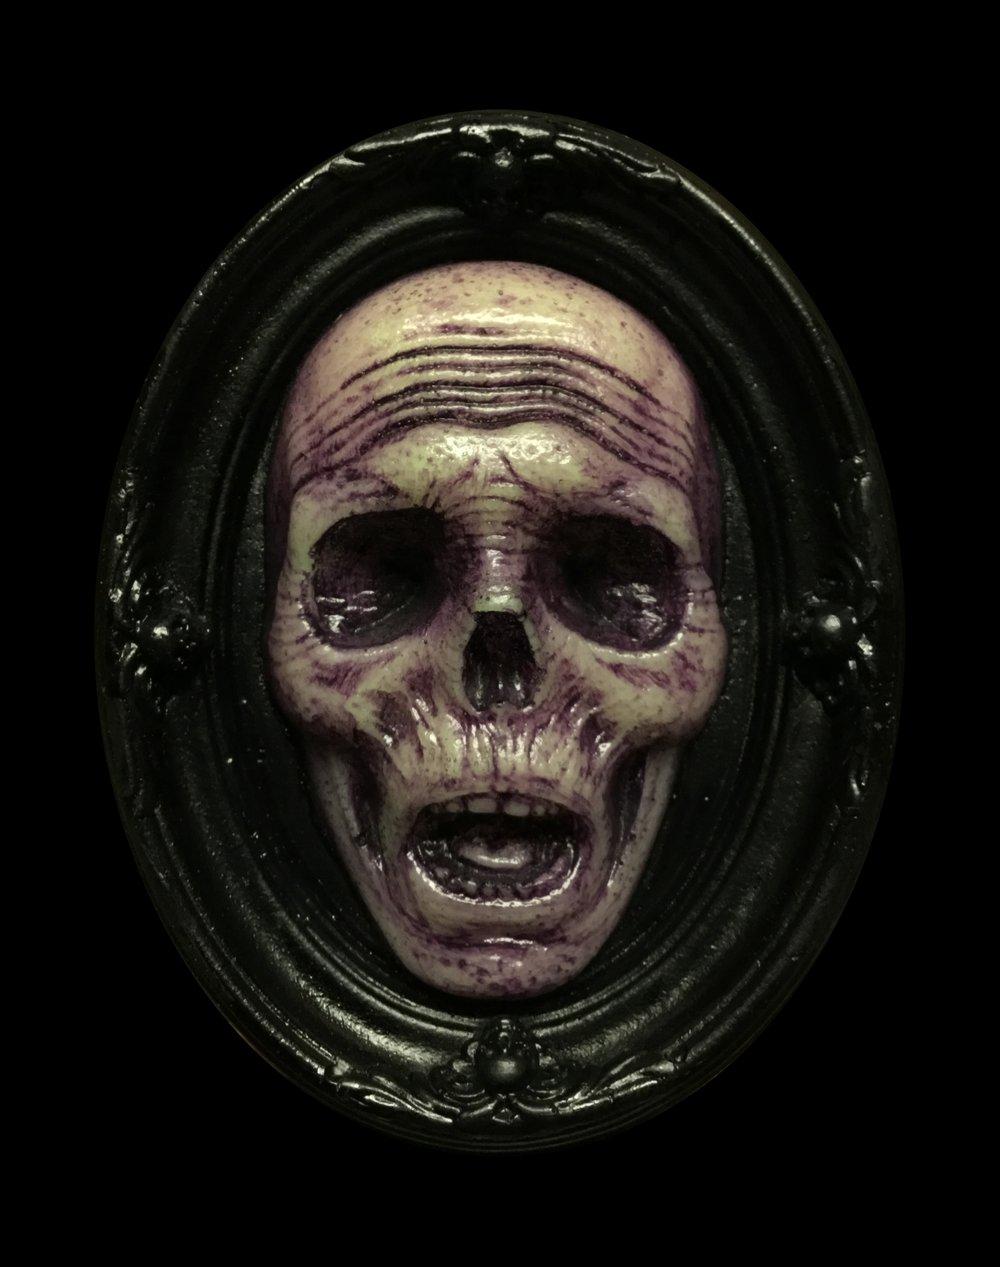 Glow in the Dark Death's Head Mini Plaque- Limited Edition- Purple Edition